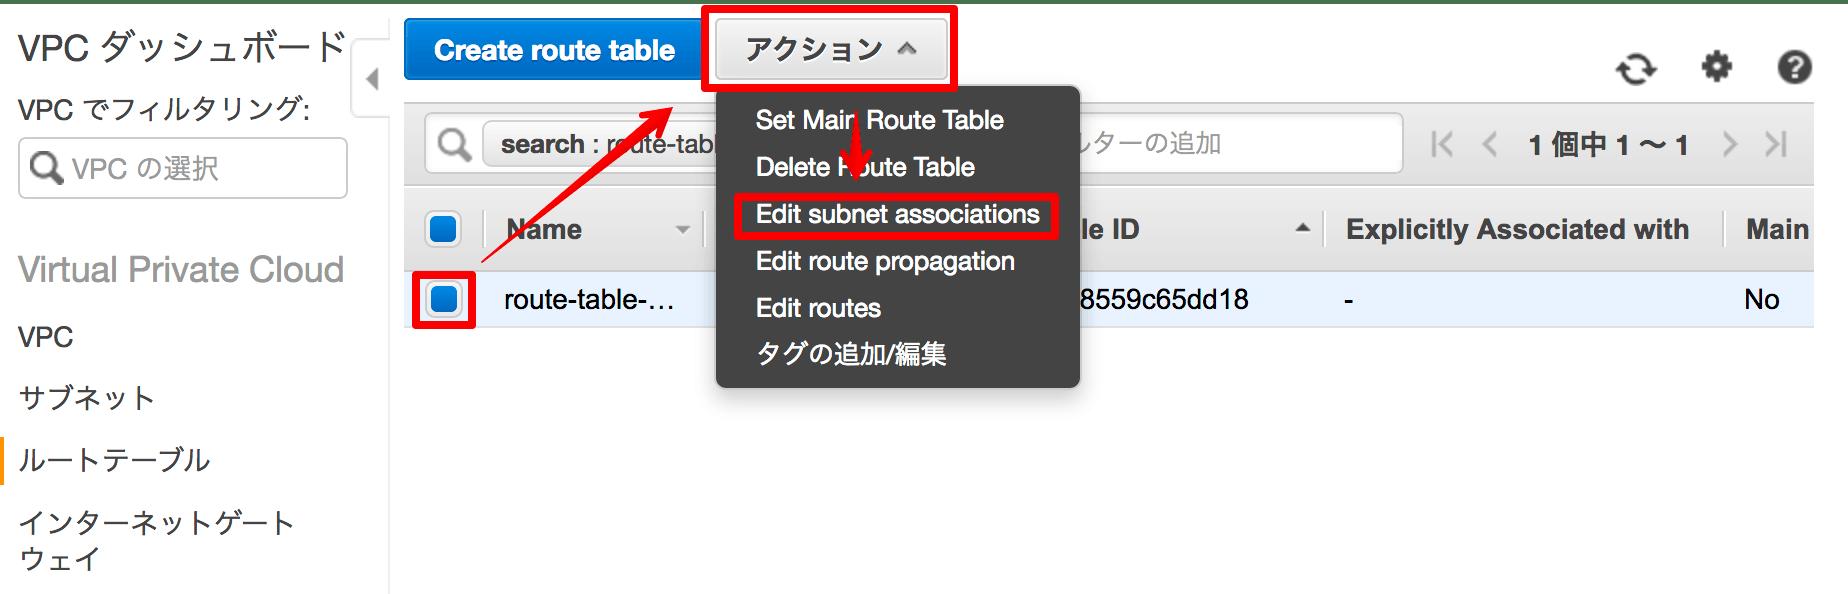 Route Tables   VPC Management Console_2018-12-11_20-06-18.png